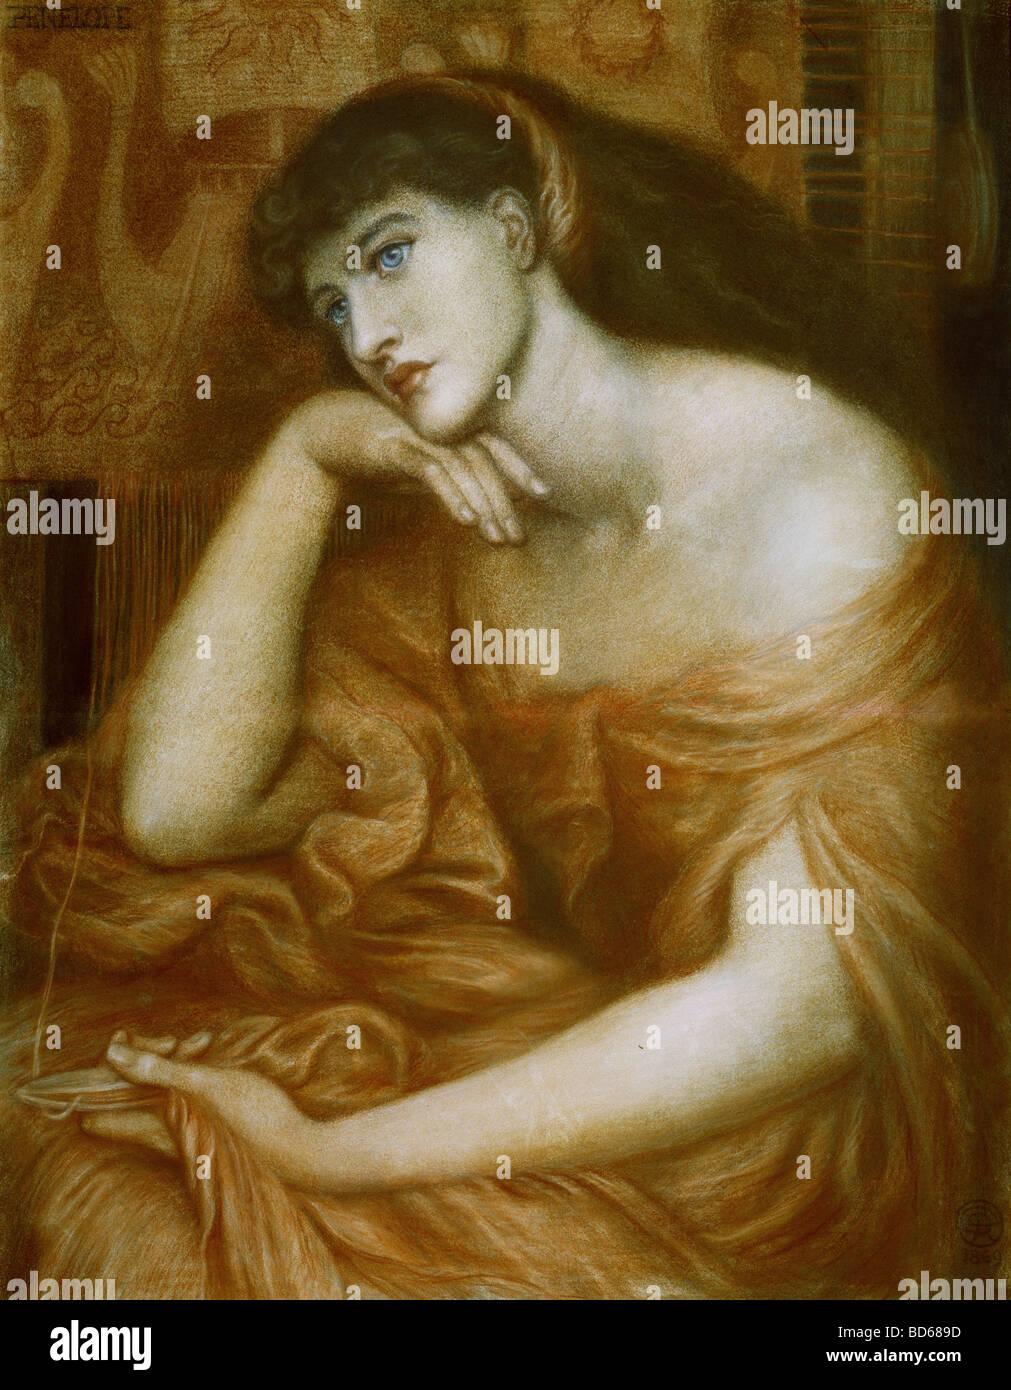 "Belle arti, Rossetti, Dante Gabriel (1828 - 1882), pittura, ""Penelope"", olio su tela, 1869, simbologia, preraffaelites, Foto Stock"